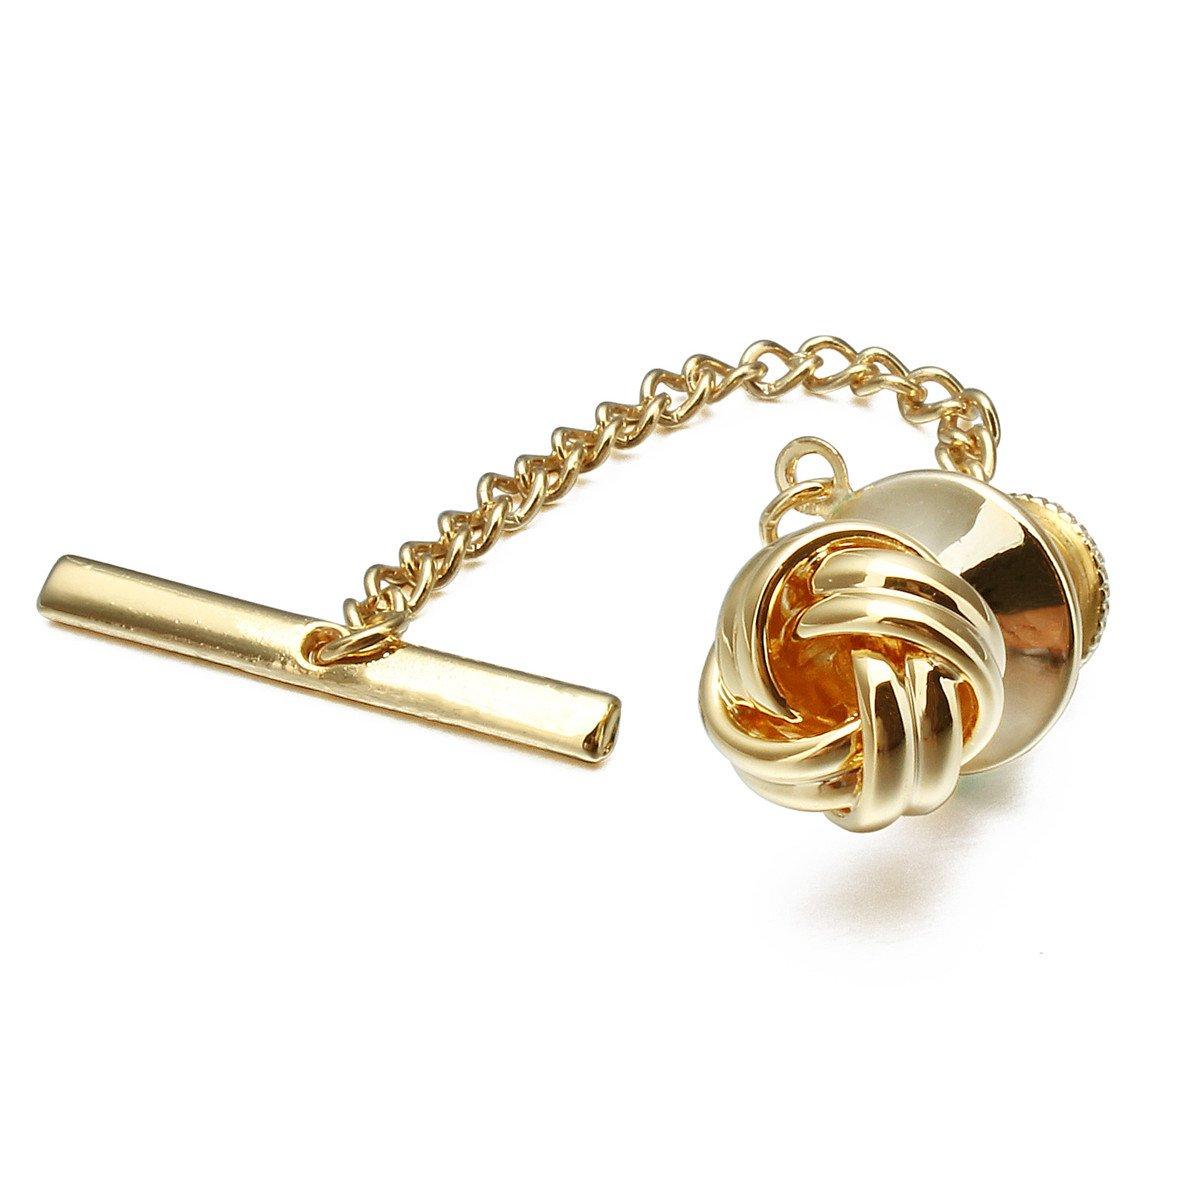 101d978b2ac1 Amazon.com: HAWSON Sailor Knot Tie Tack for Men Metal Tie Pin Gold: Jewelry